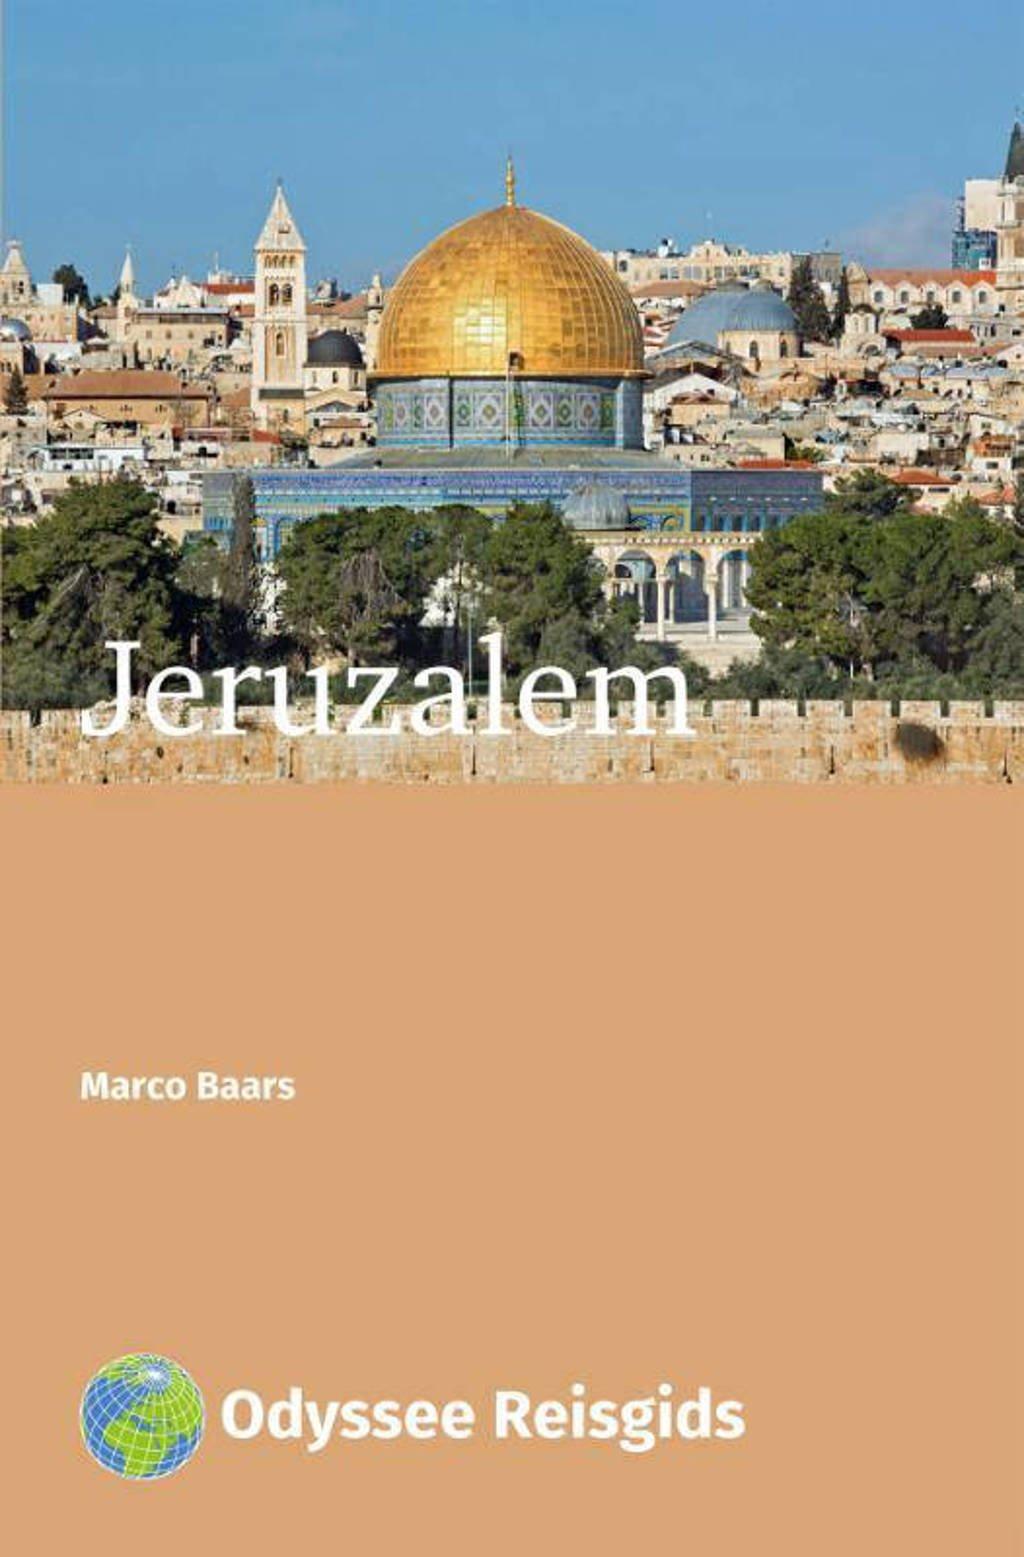 Odyssee Reisgidsen: Jeruzalem - Marco Baars